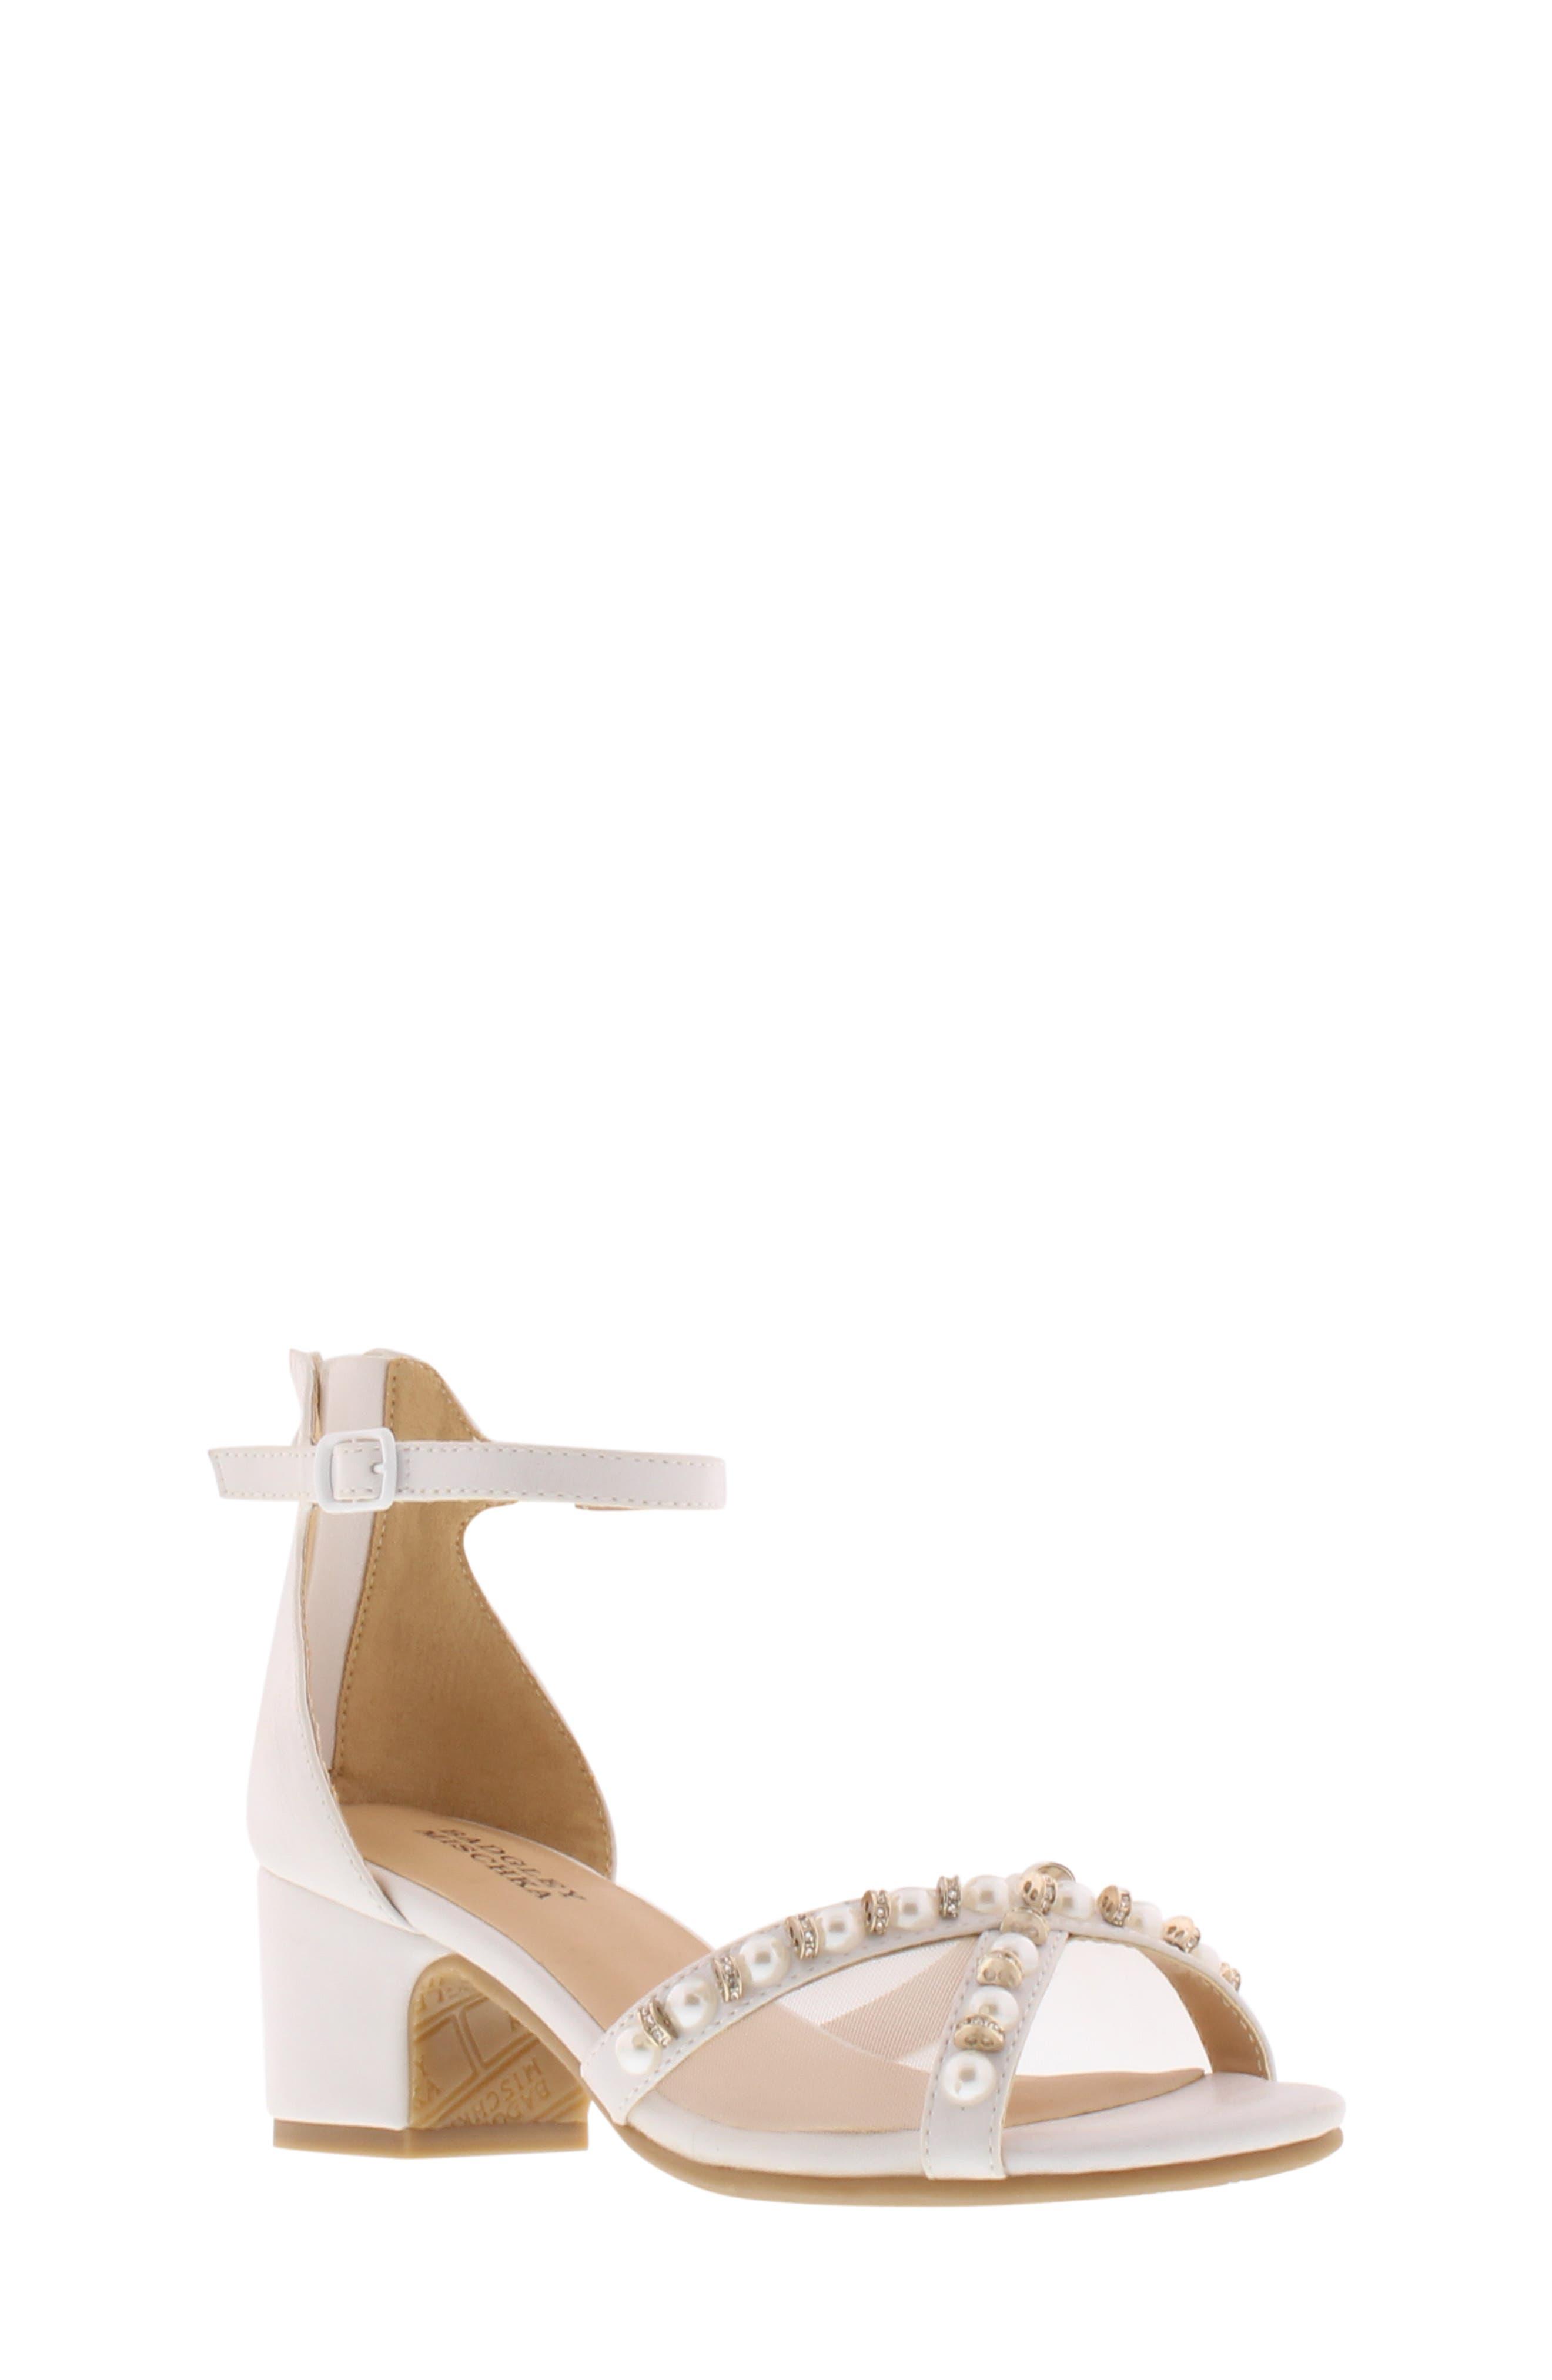 Badgley Mischka Pernia Emily Embellished Sandal, Main, color, WHITE SHIMMER